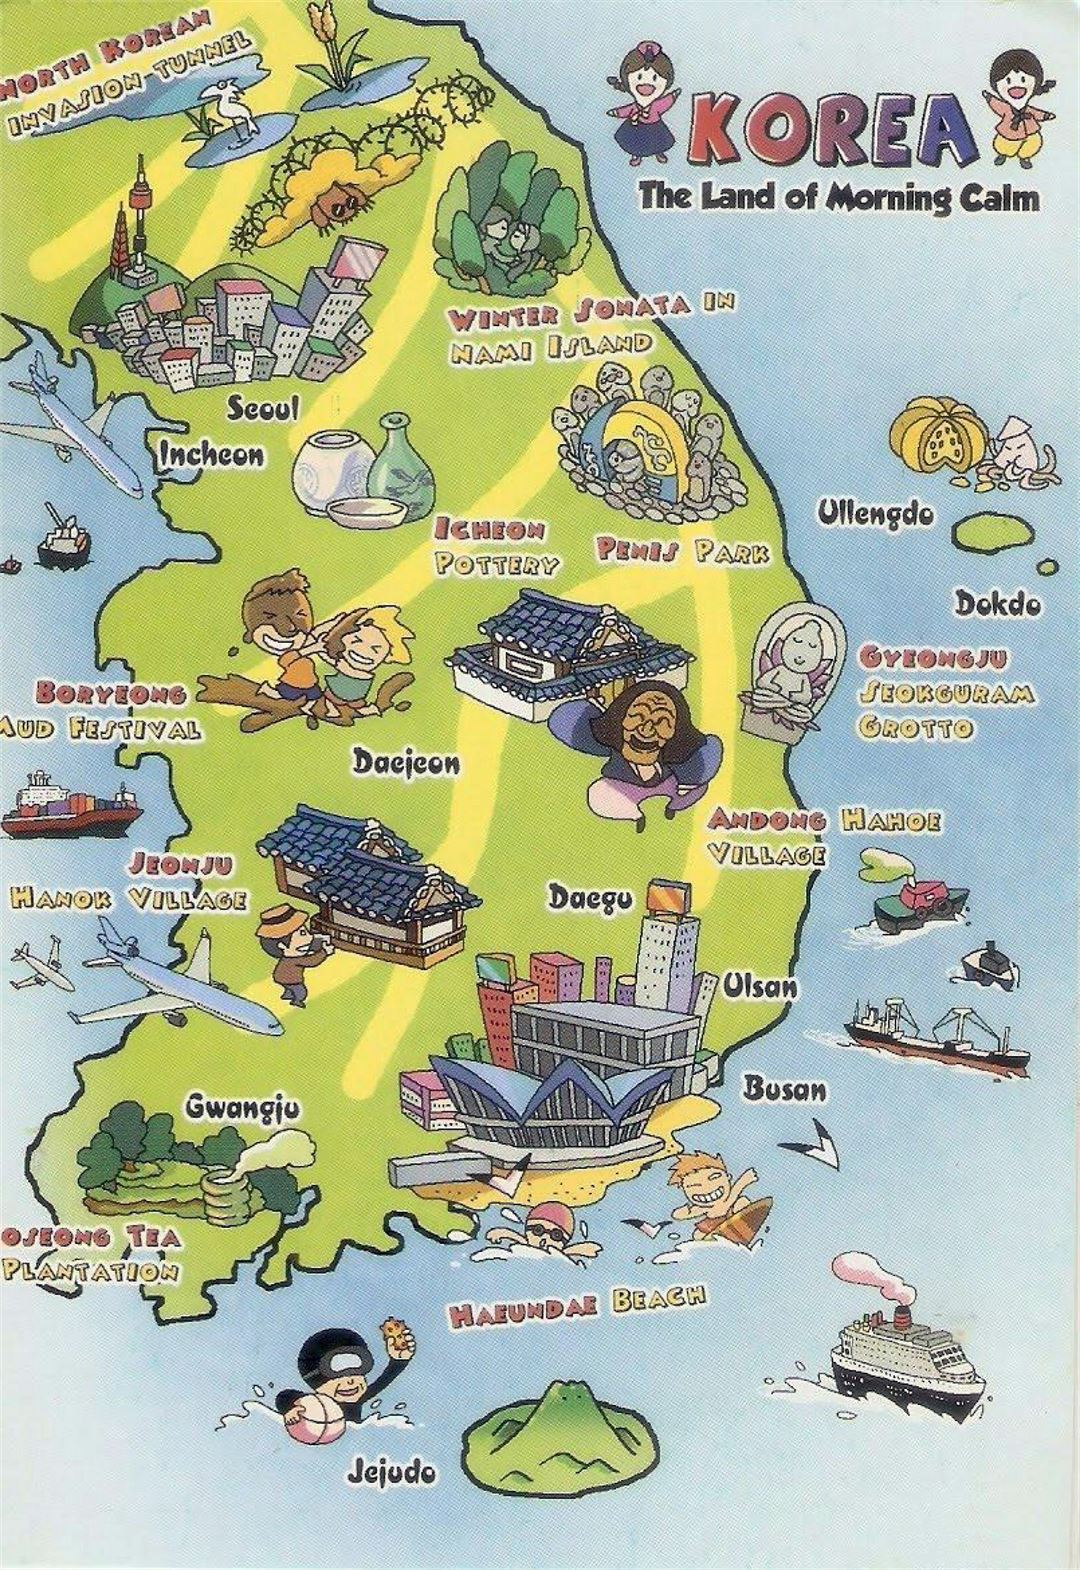 Tourist illustrated map of South Korea South Korea Asia Mapsland Maps